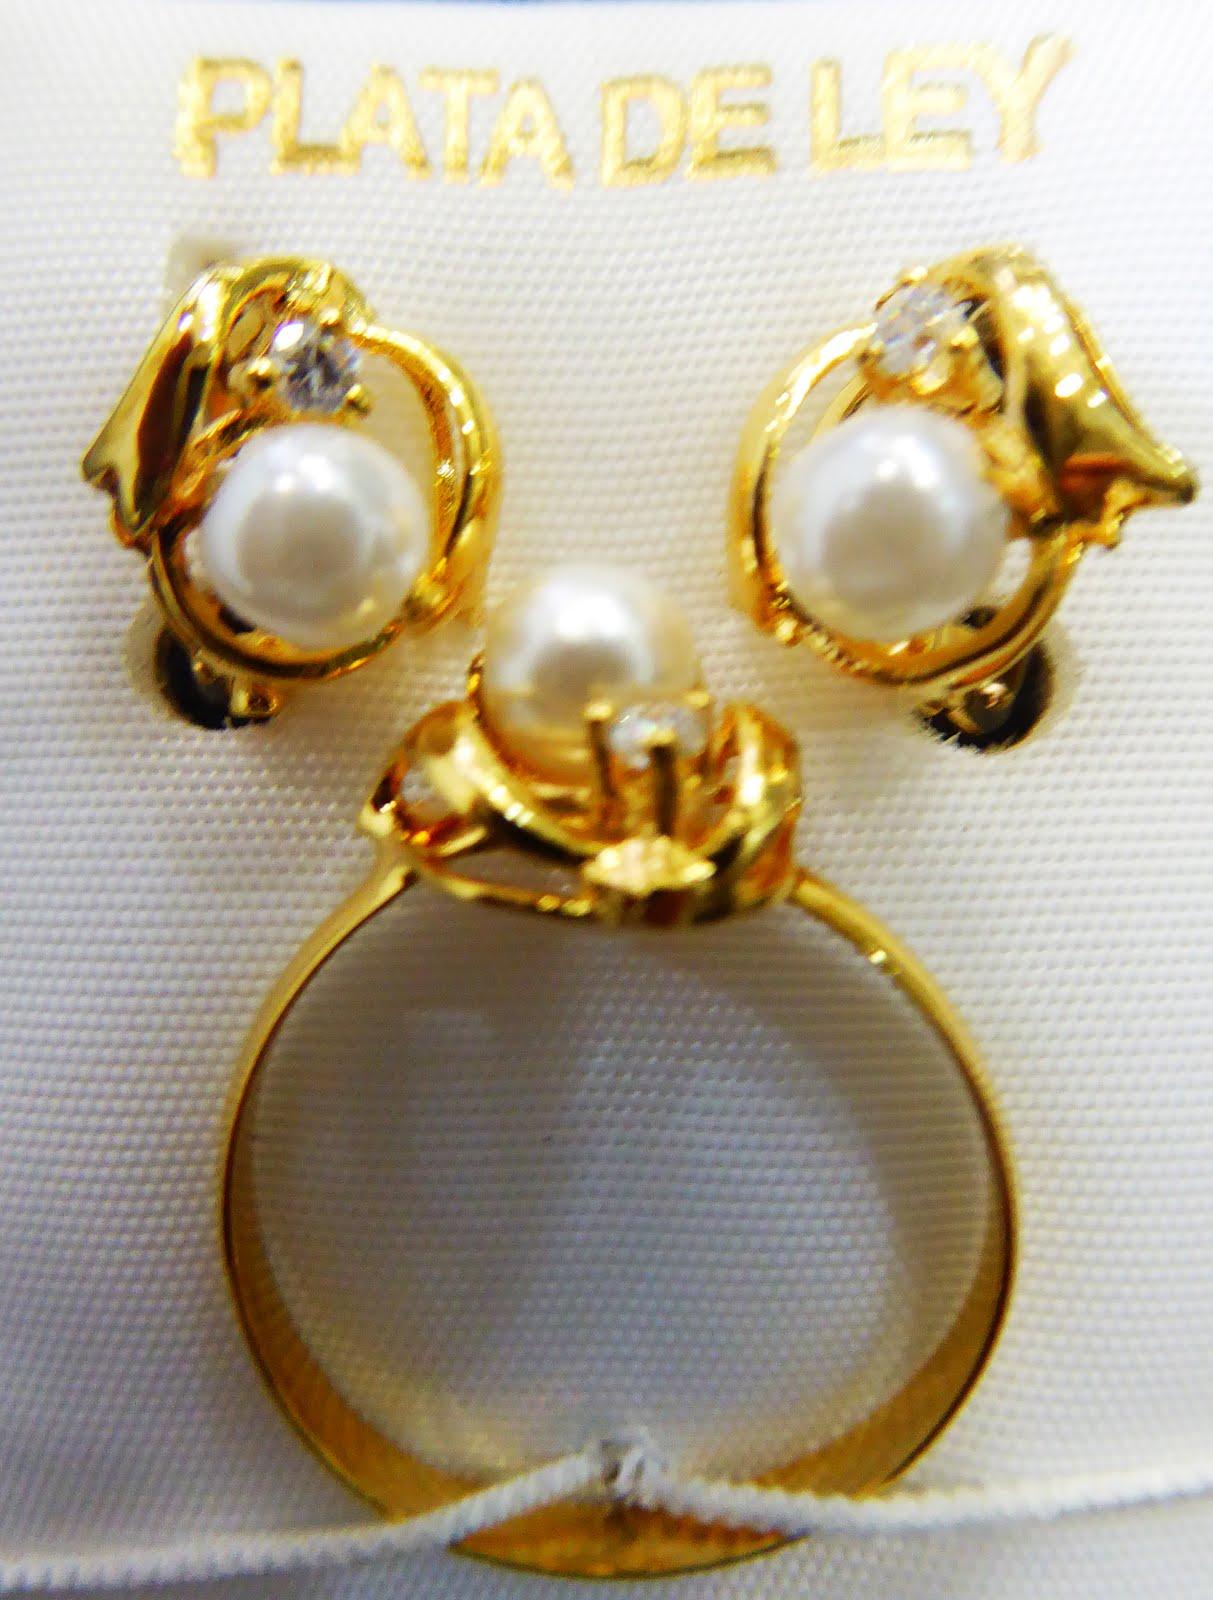 Juego de plata dorada, terminación de joyería